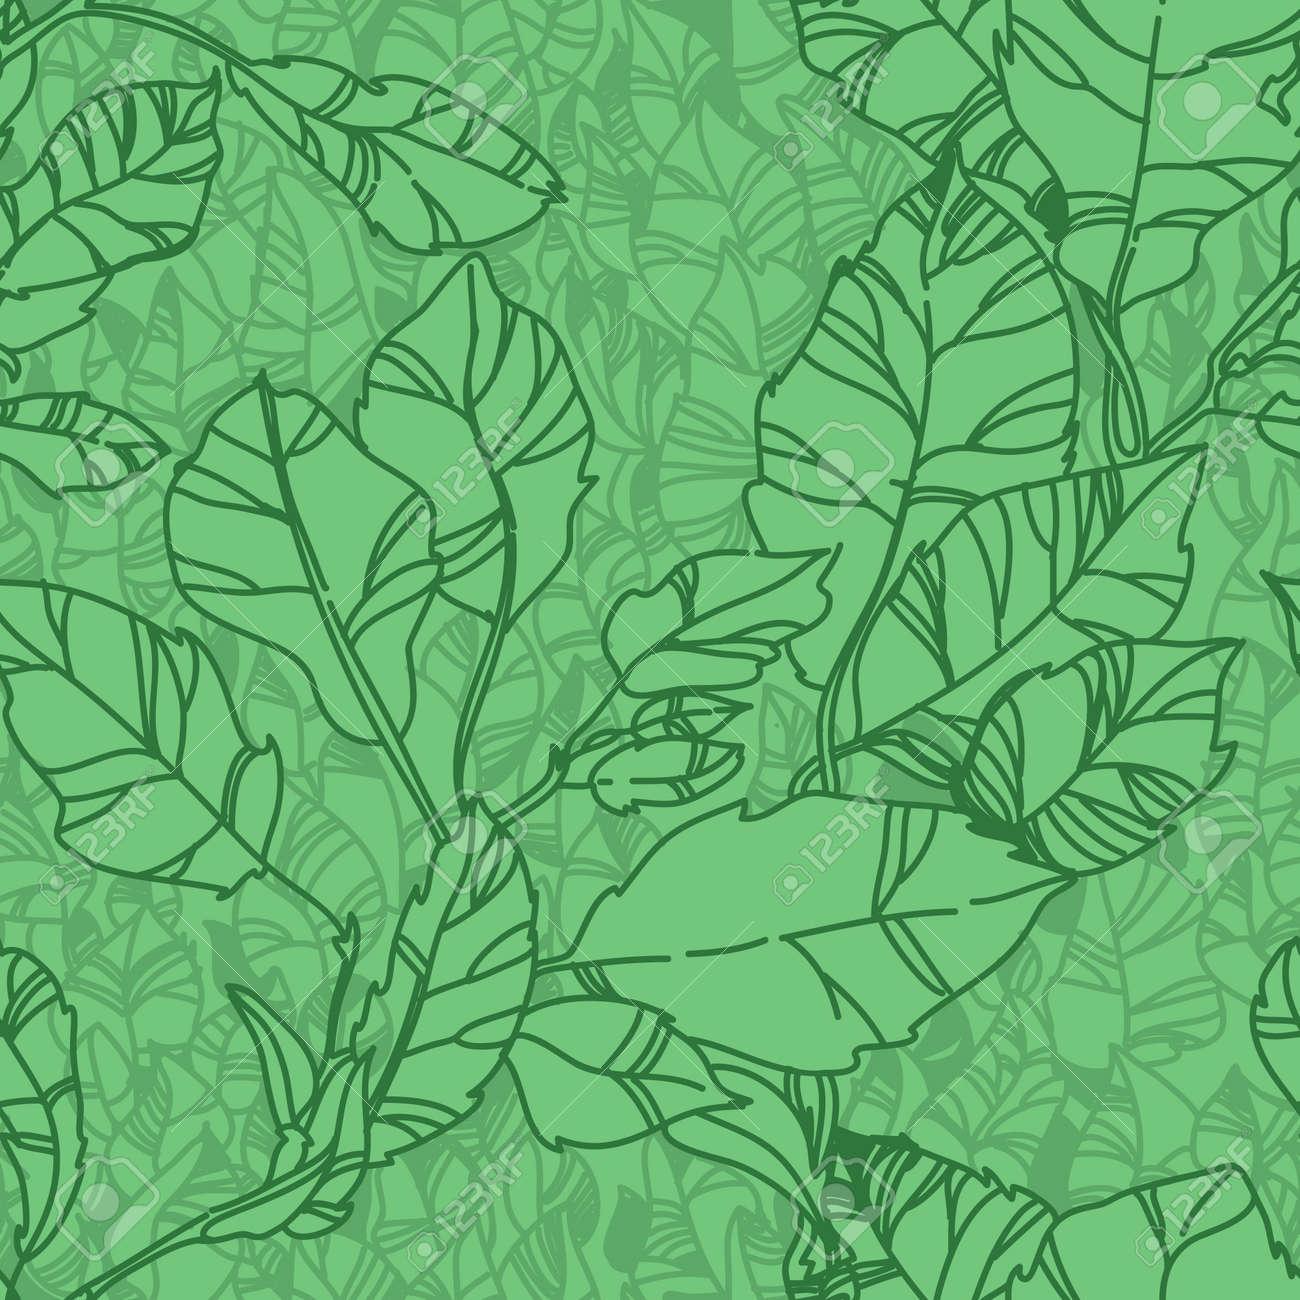 green pattern with leaf,summer leaf background - 14315515